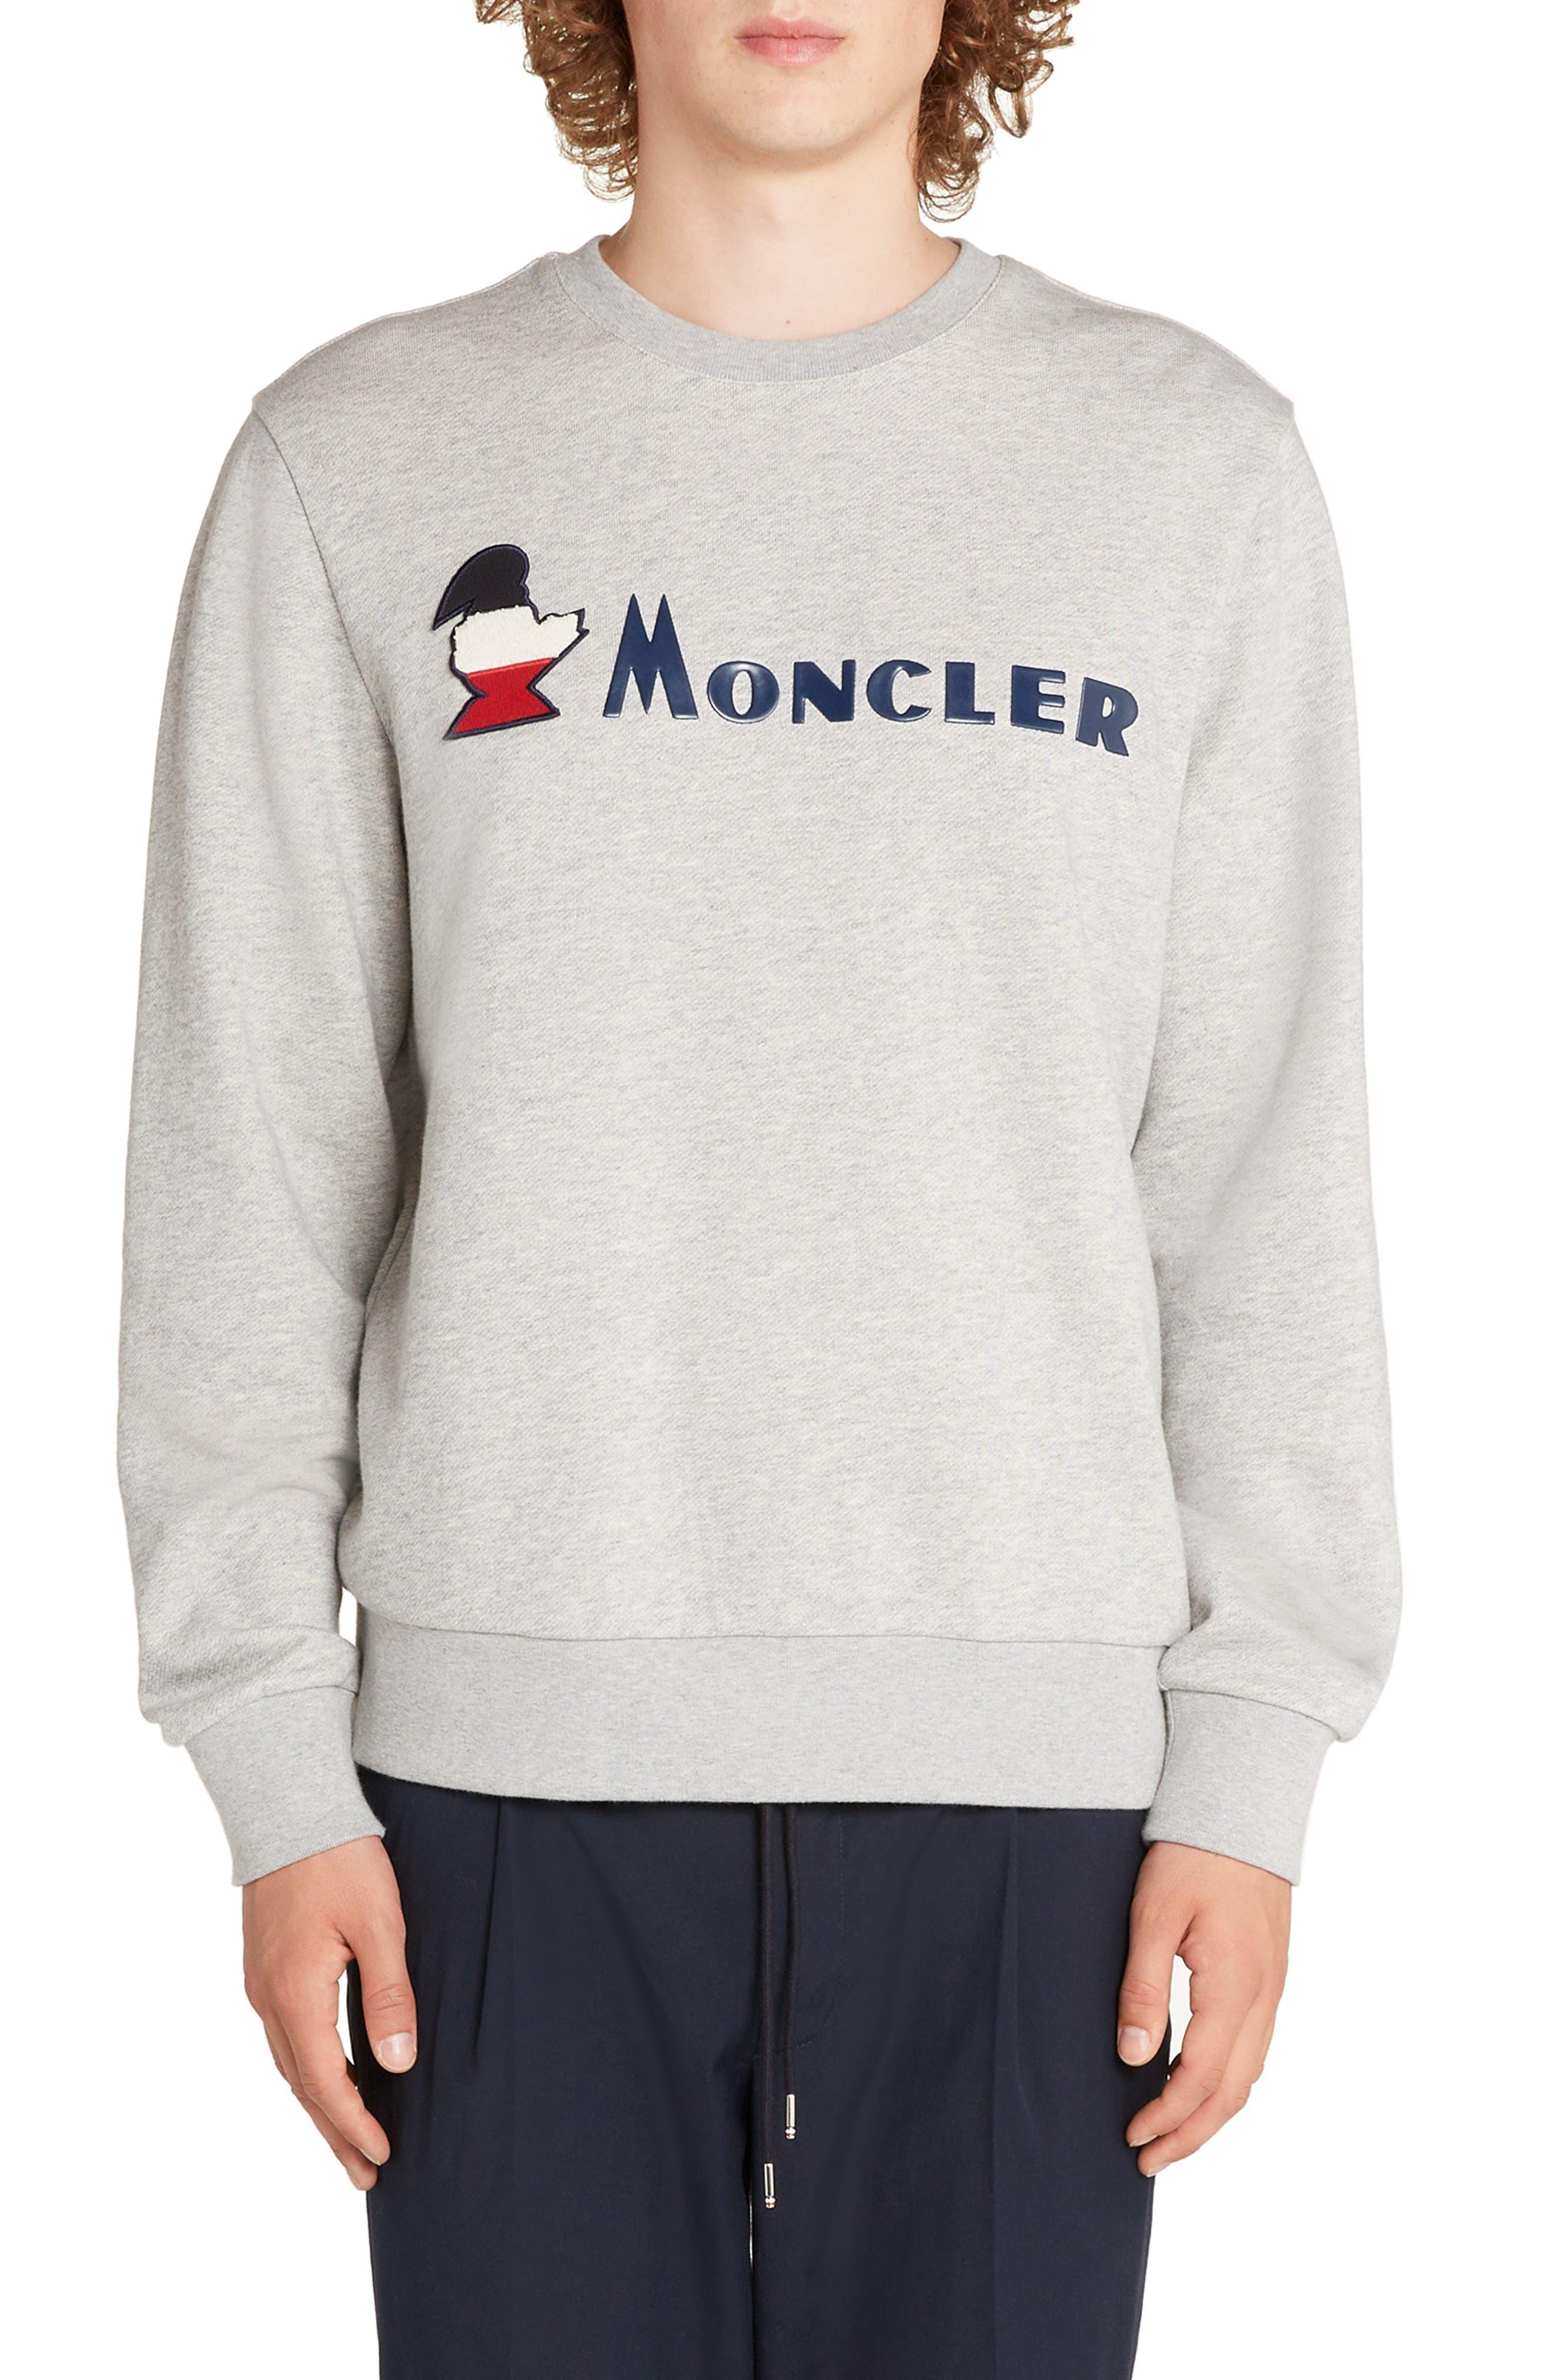 MONCLER,                             Logo Crewneck Sweatshirt,                             Main thumbnail 1, color,                             DARK GREY